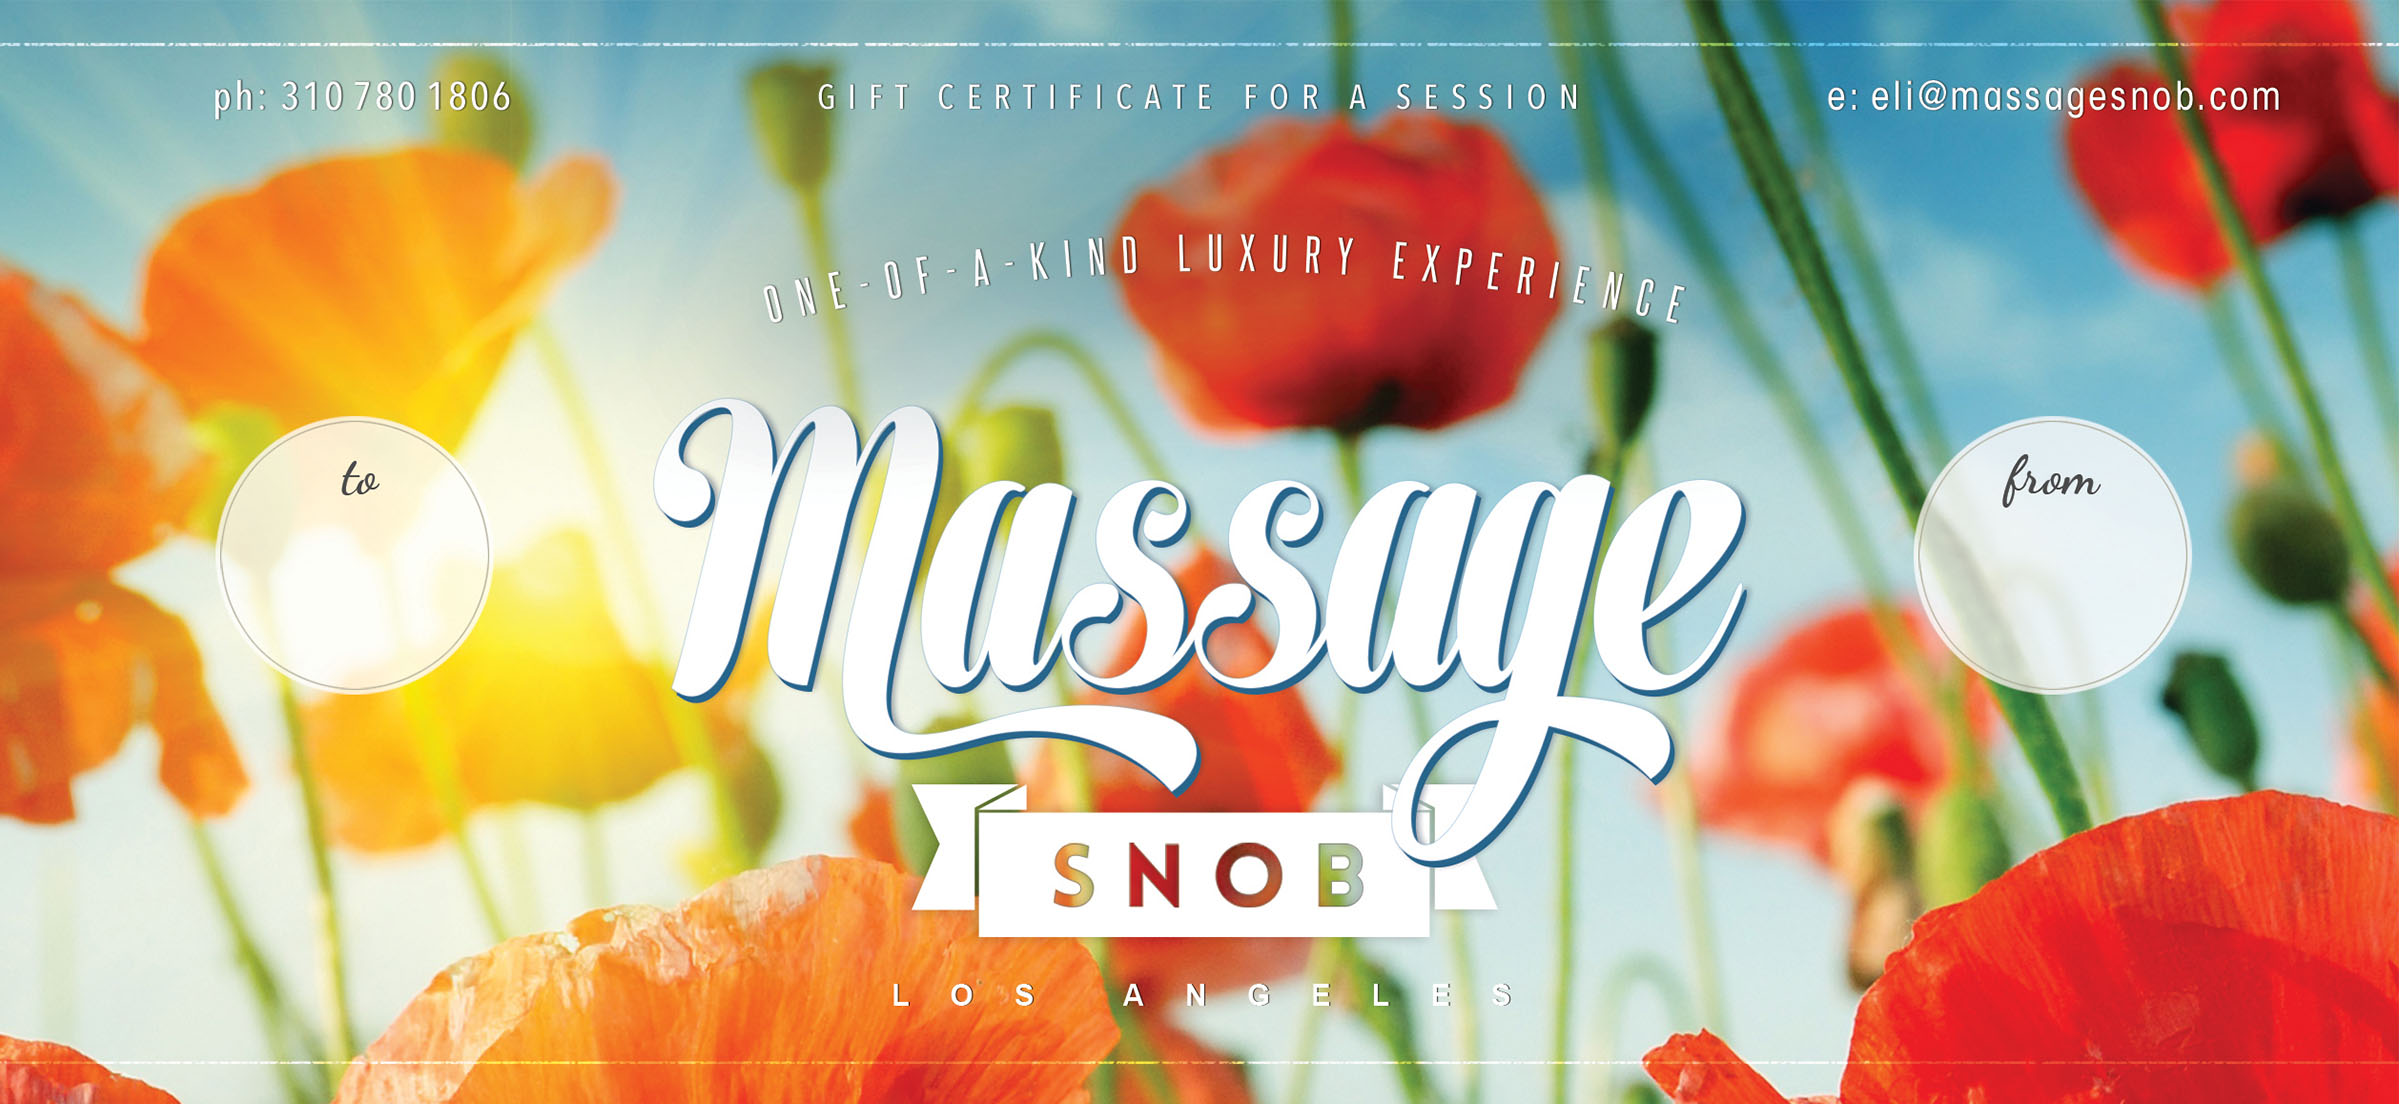 massage snob gift certificate poppies.jpg